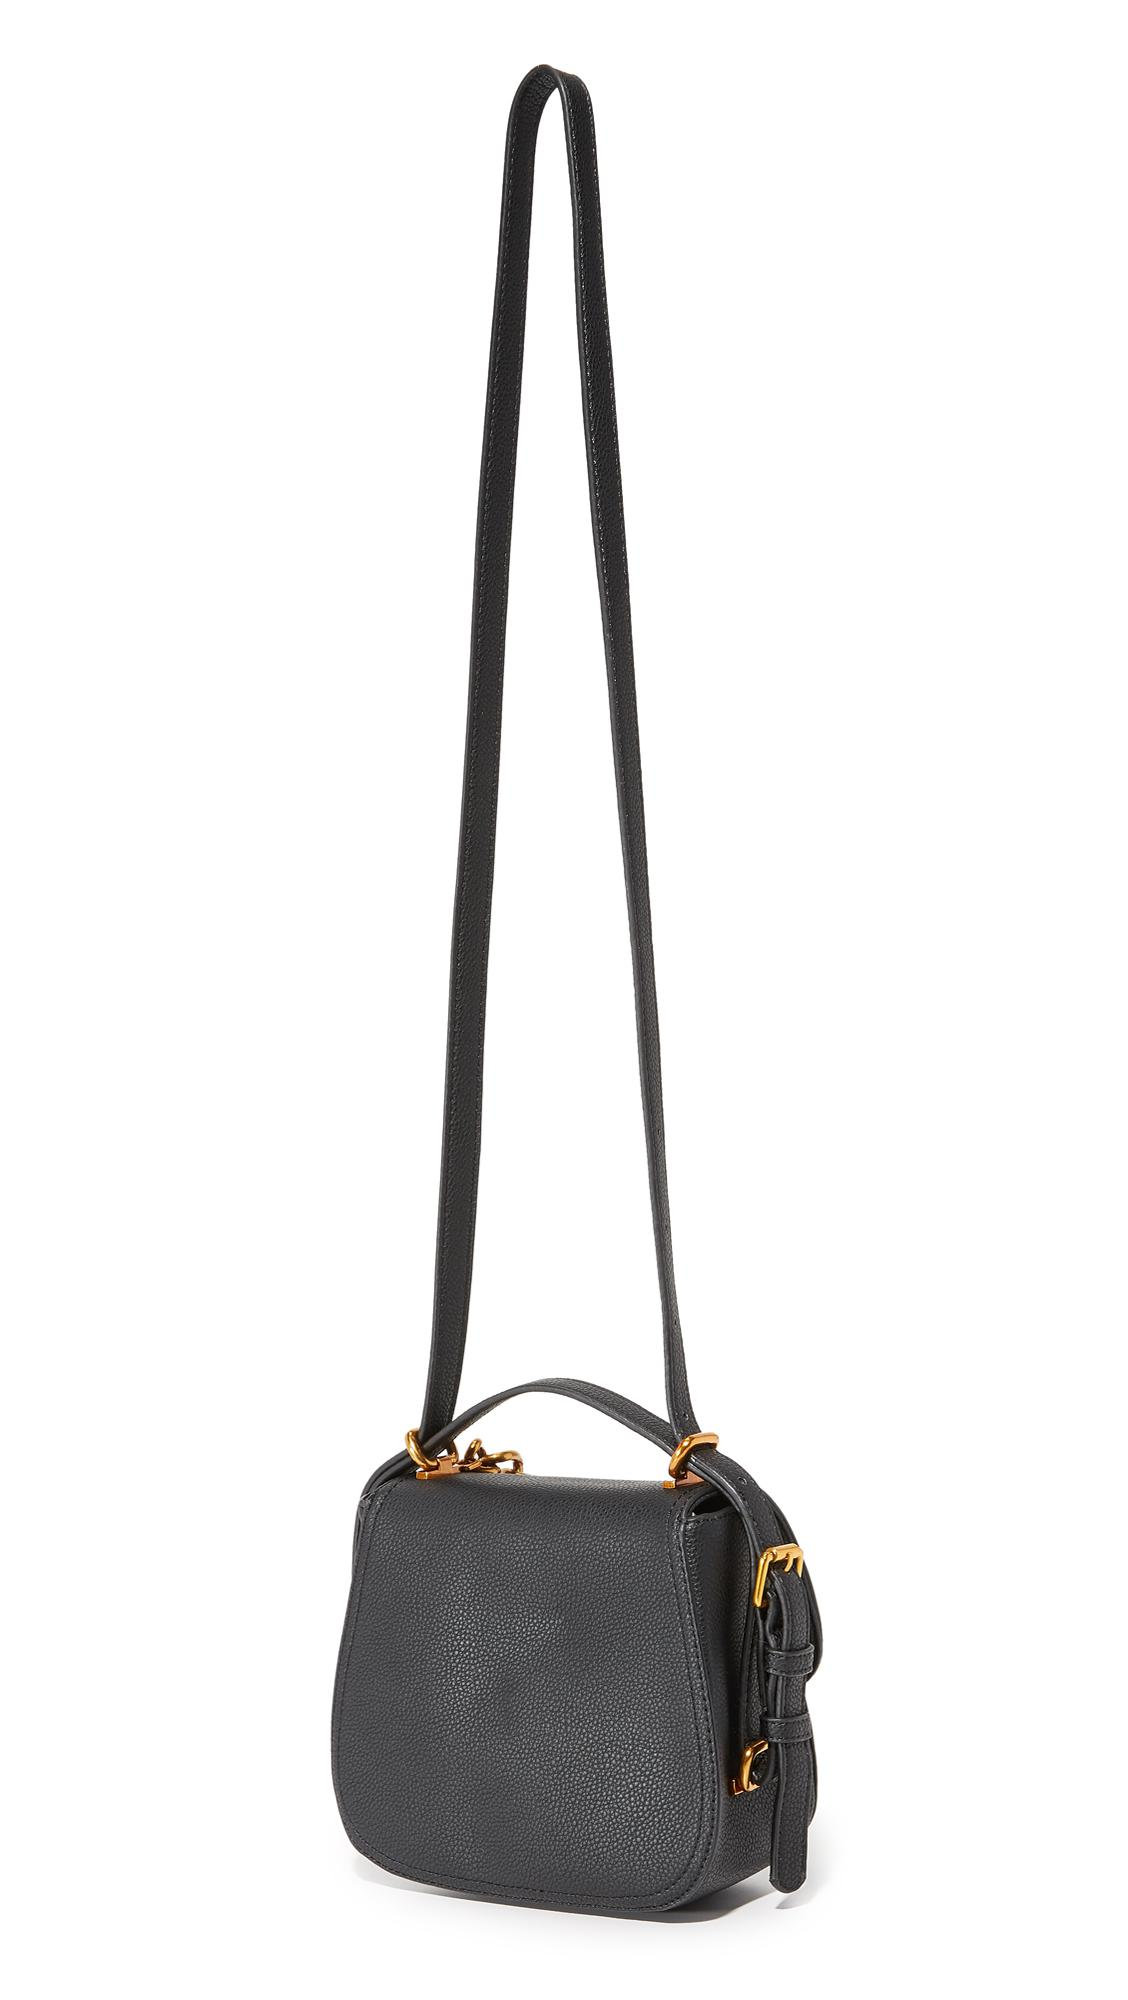 Deux Lux Roma Chain Cross Body Bag in Black